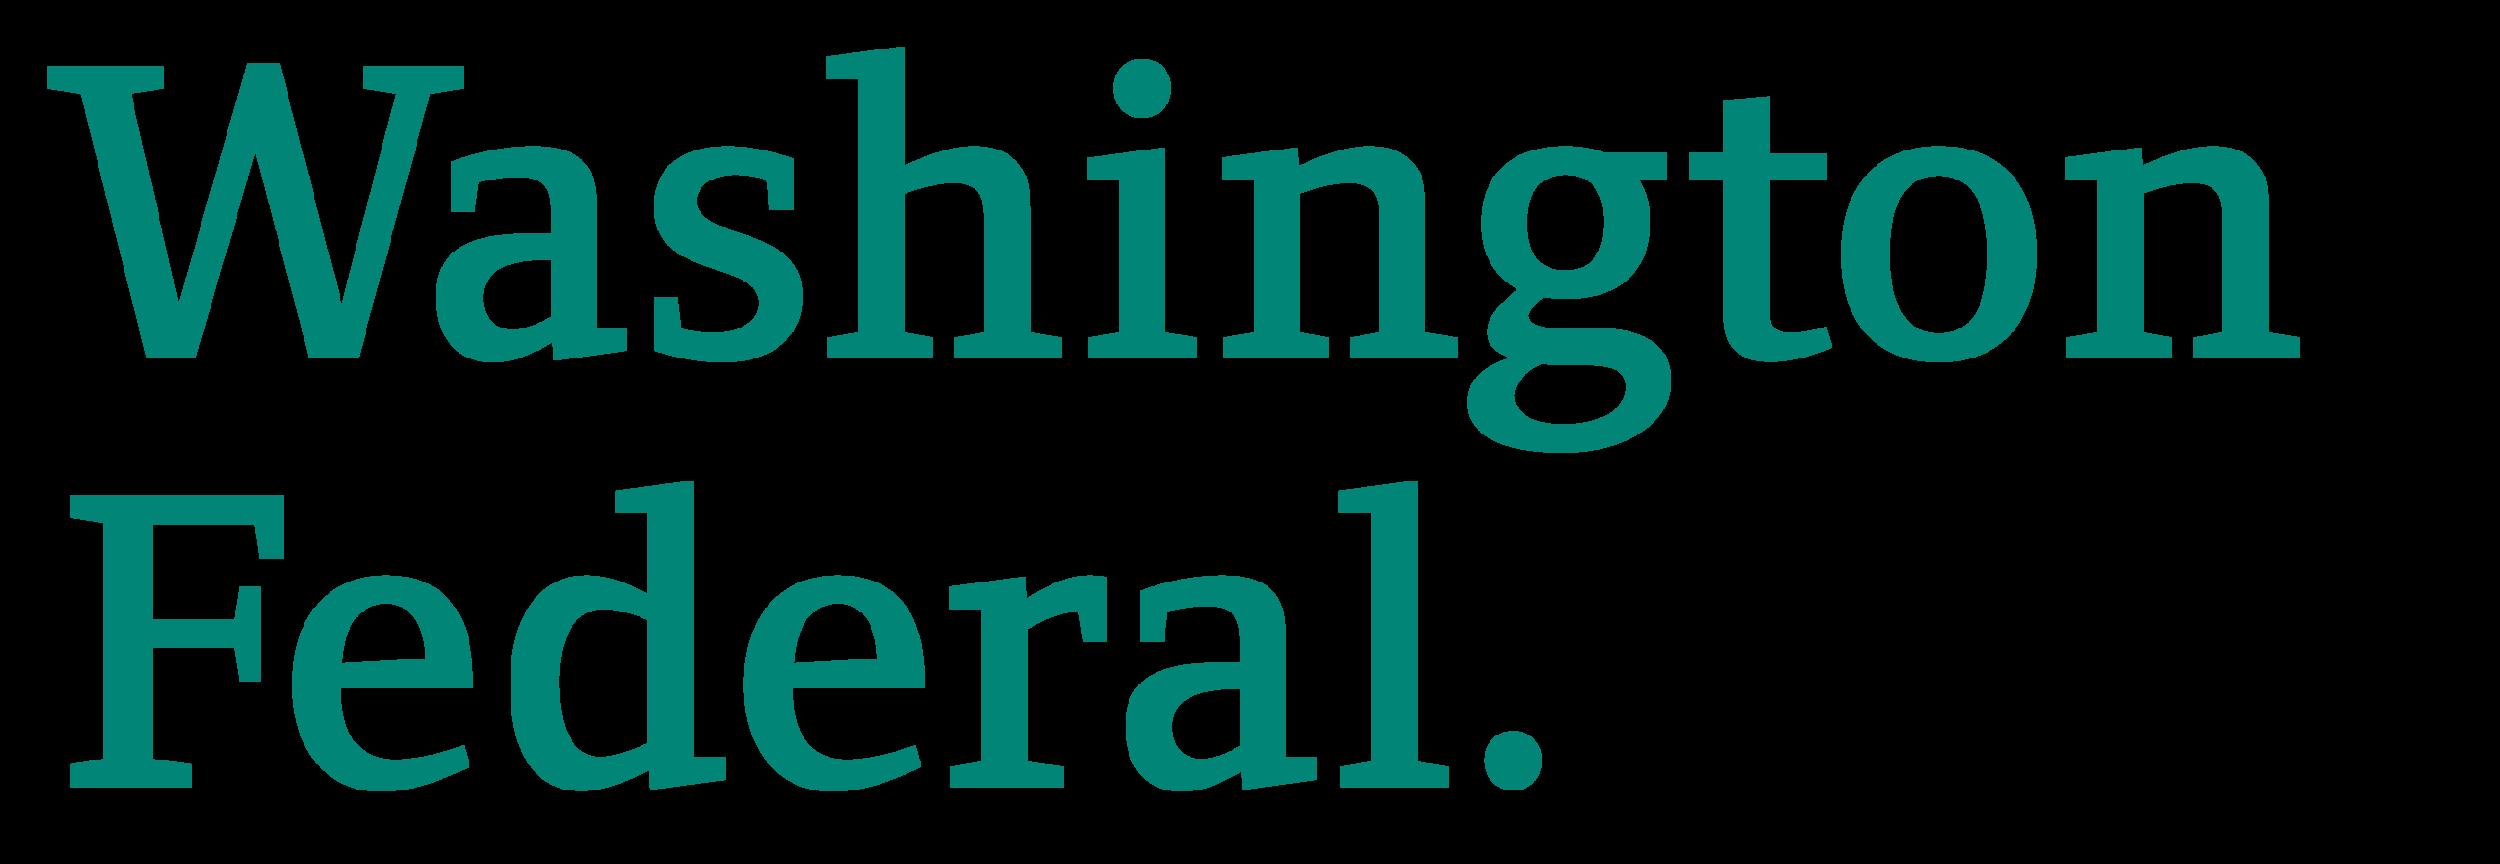 WashFed_logo_notag.png